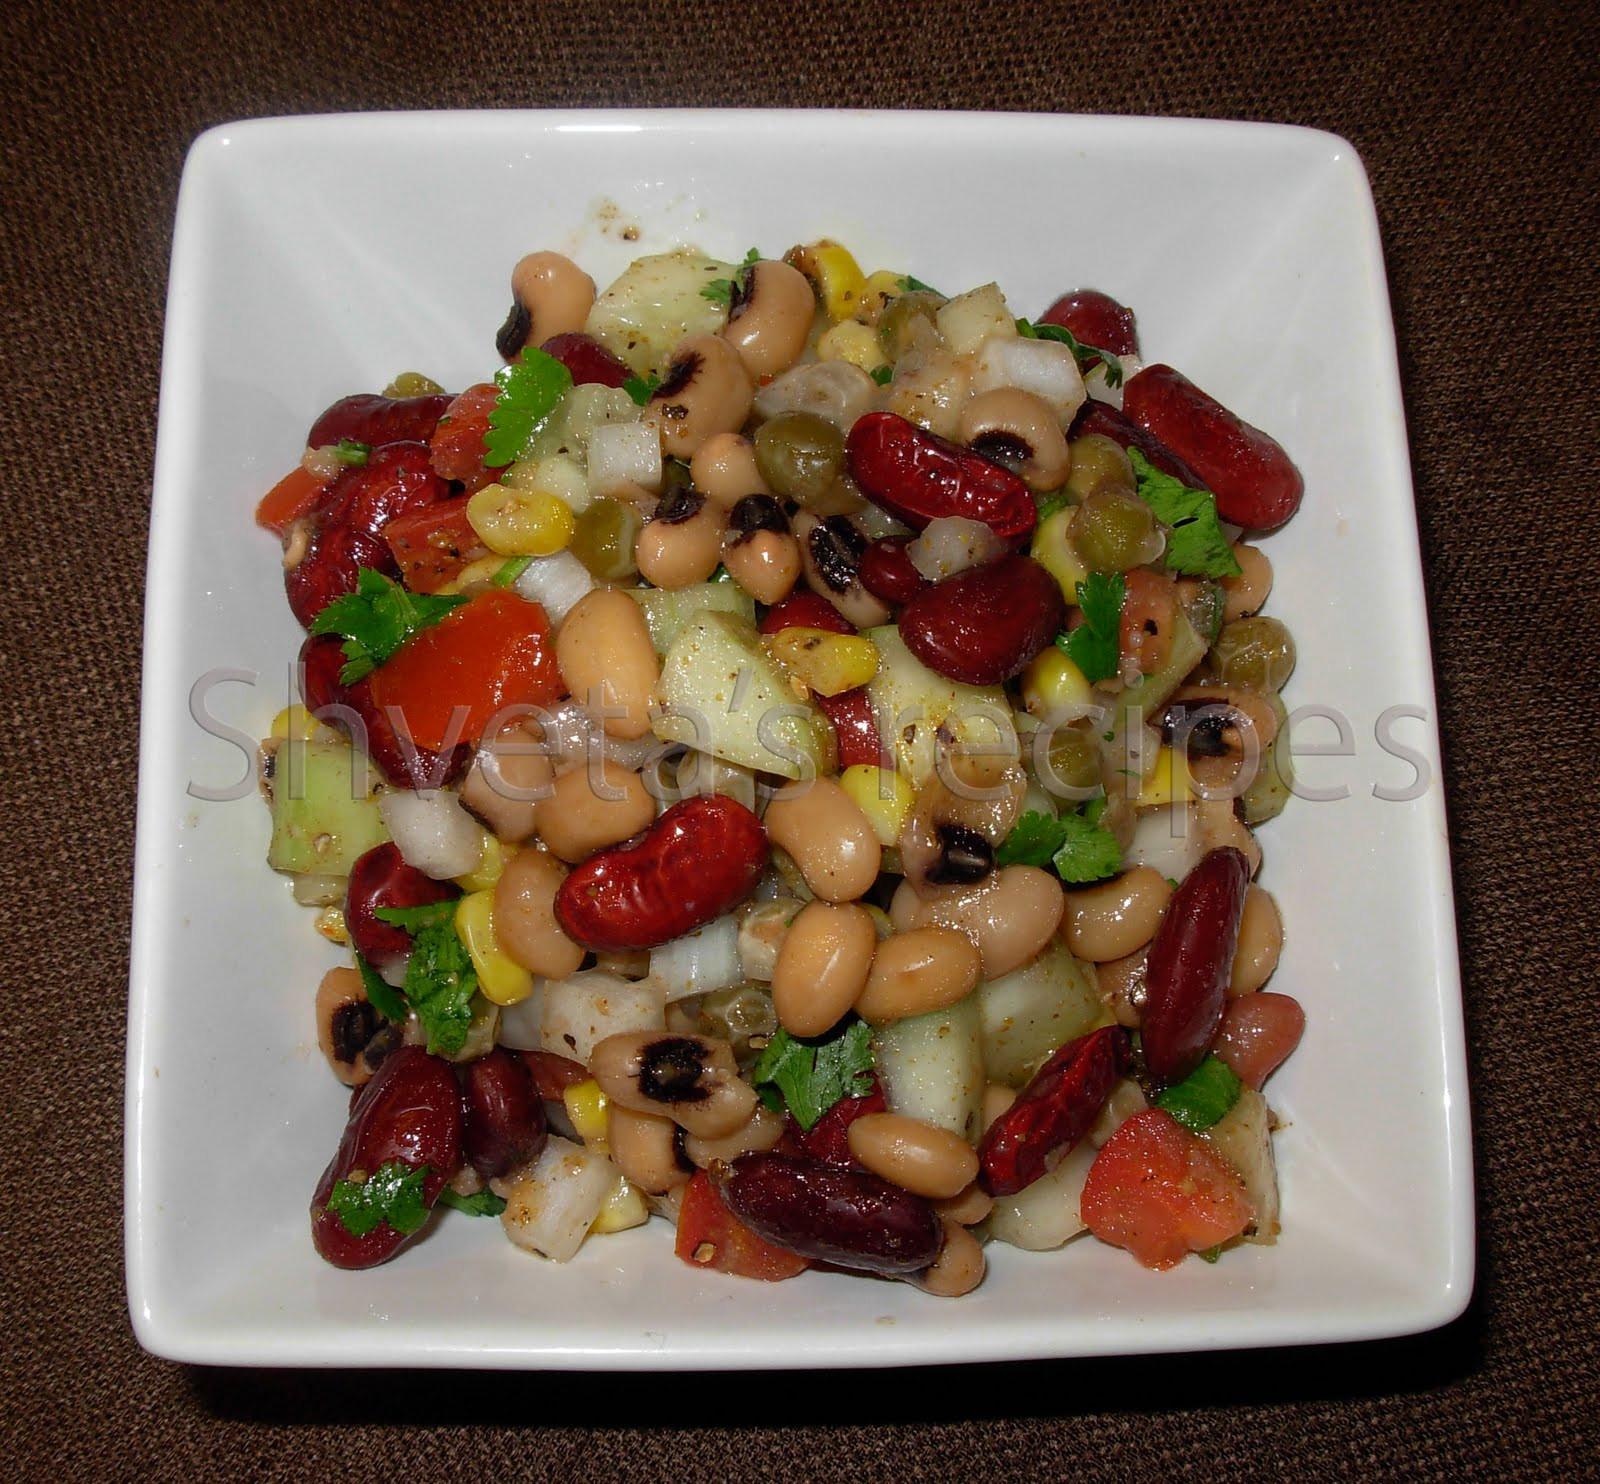 Healthy Protein Salads  Shveta s Recipes Celebrating Health High Protein Bean Salad